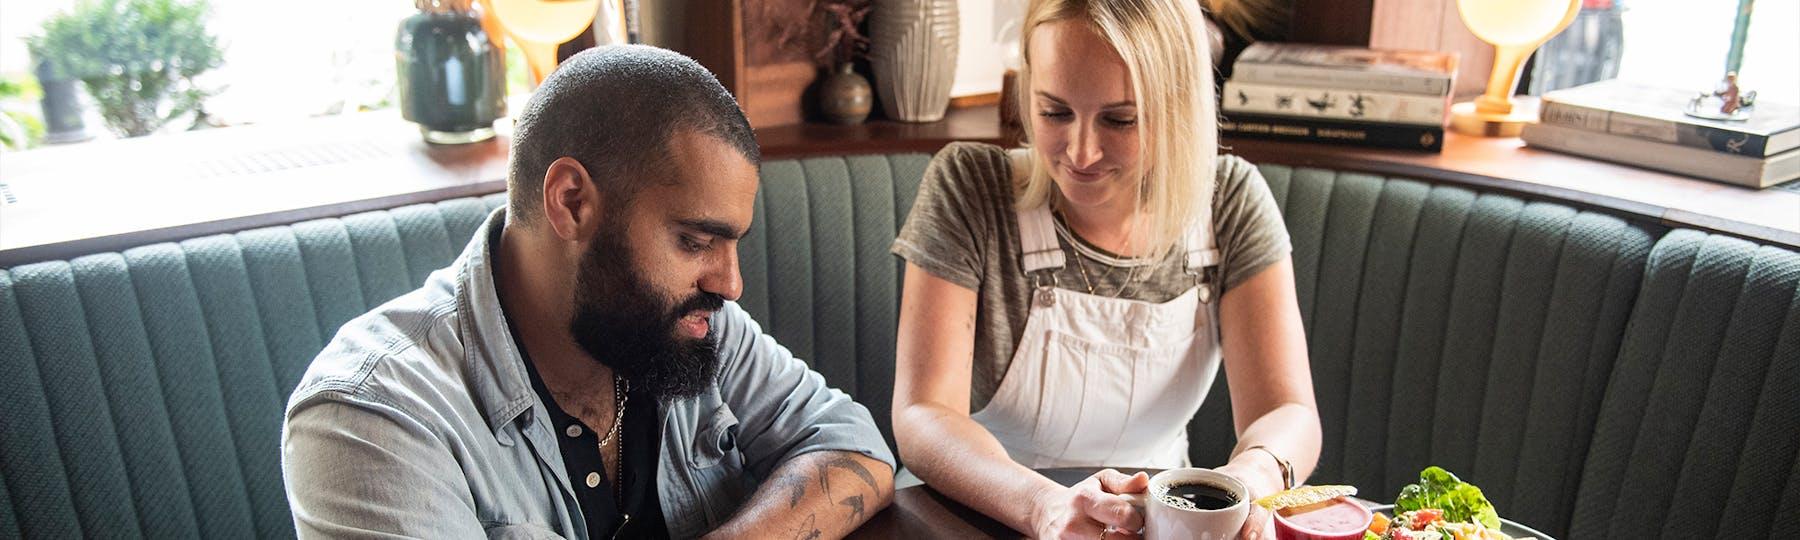 Customer working with BentoBox team member